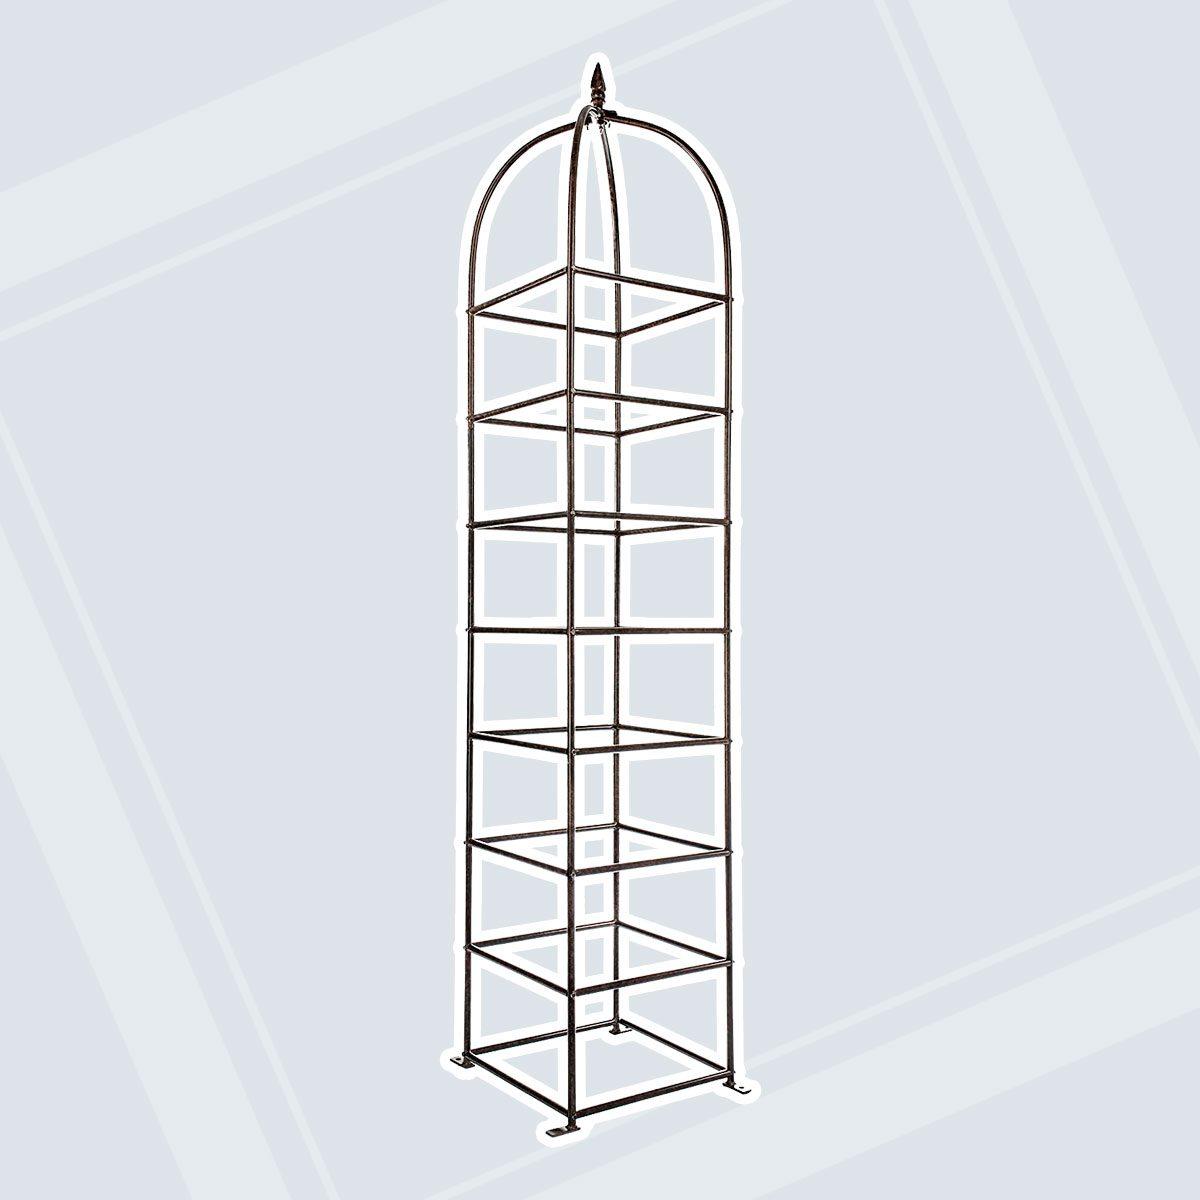 H Potter Trellis Large Obelisk for Climbing Garden Plants Weather Resistant Iron and Metal Vertical Yard Art